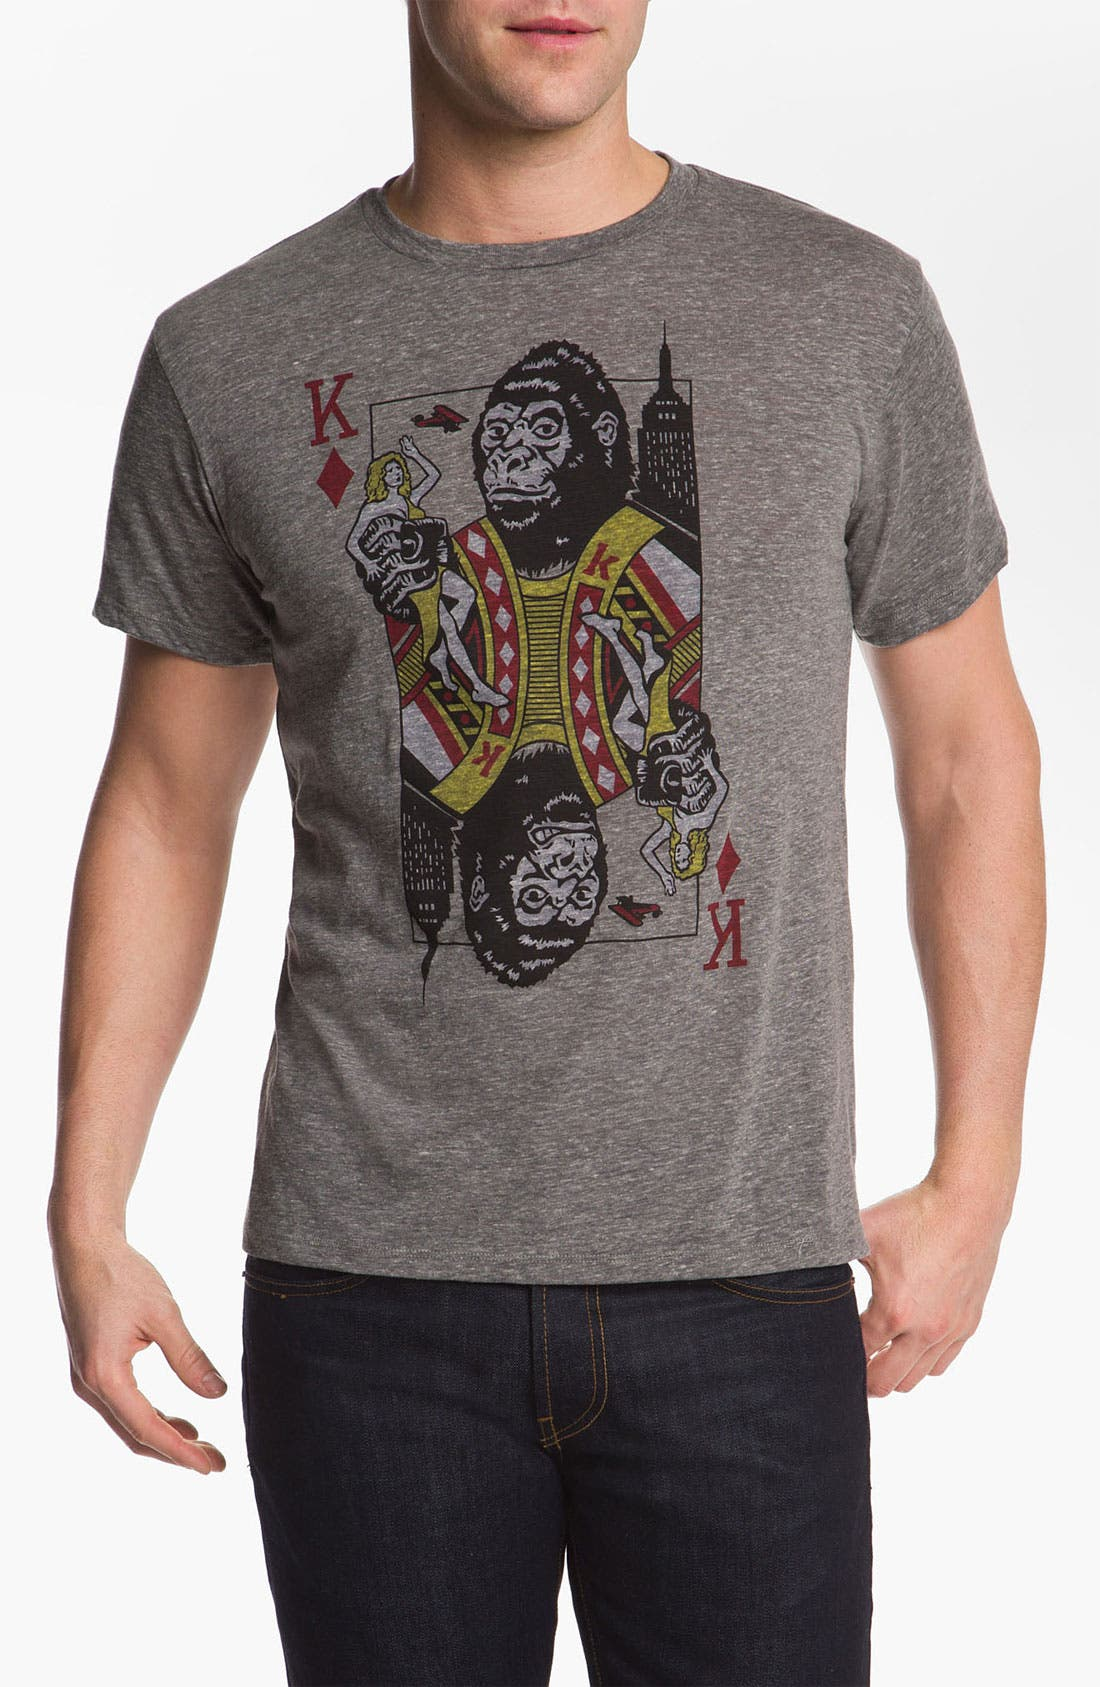 Main Image - Headline Shirts 'King' Graphic T-Shirt